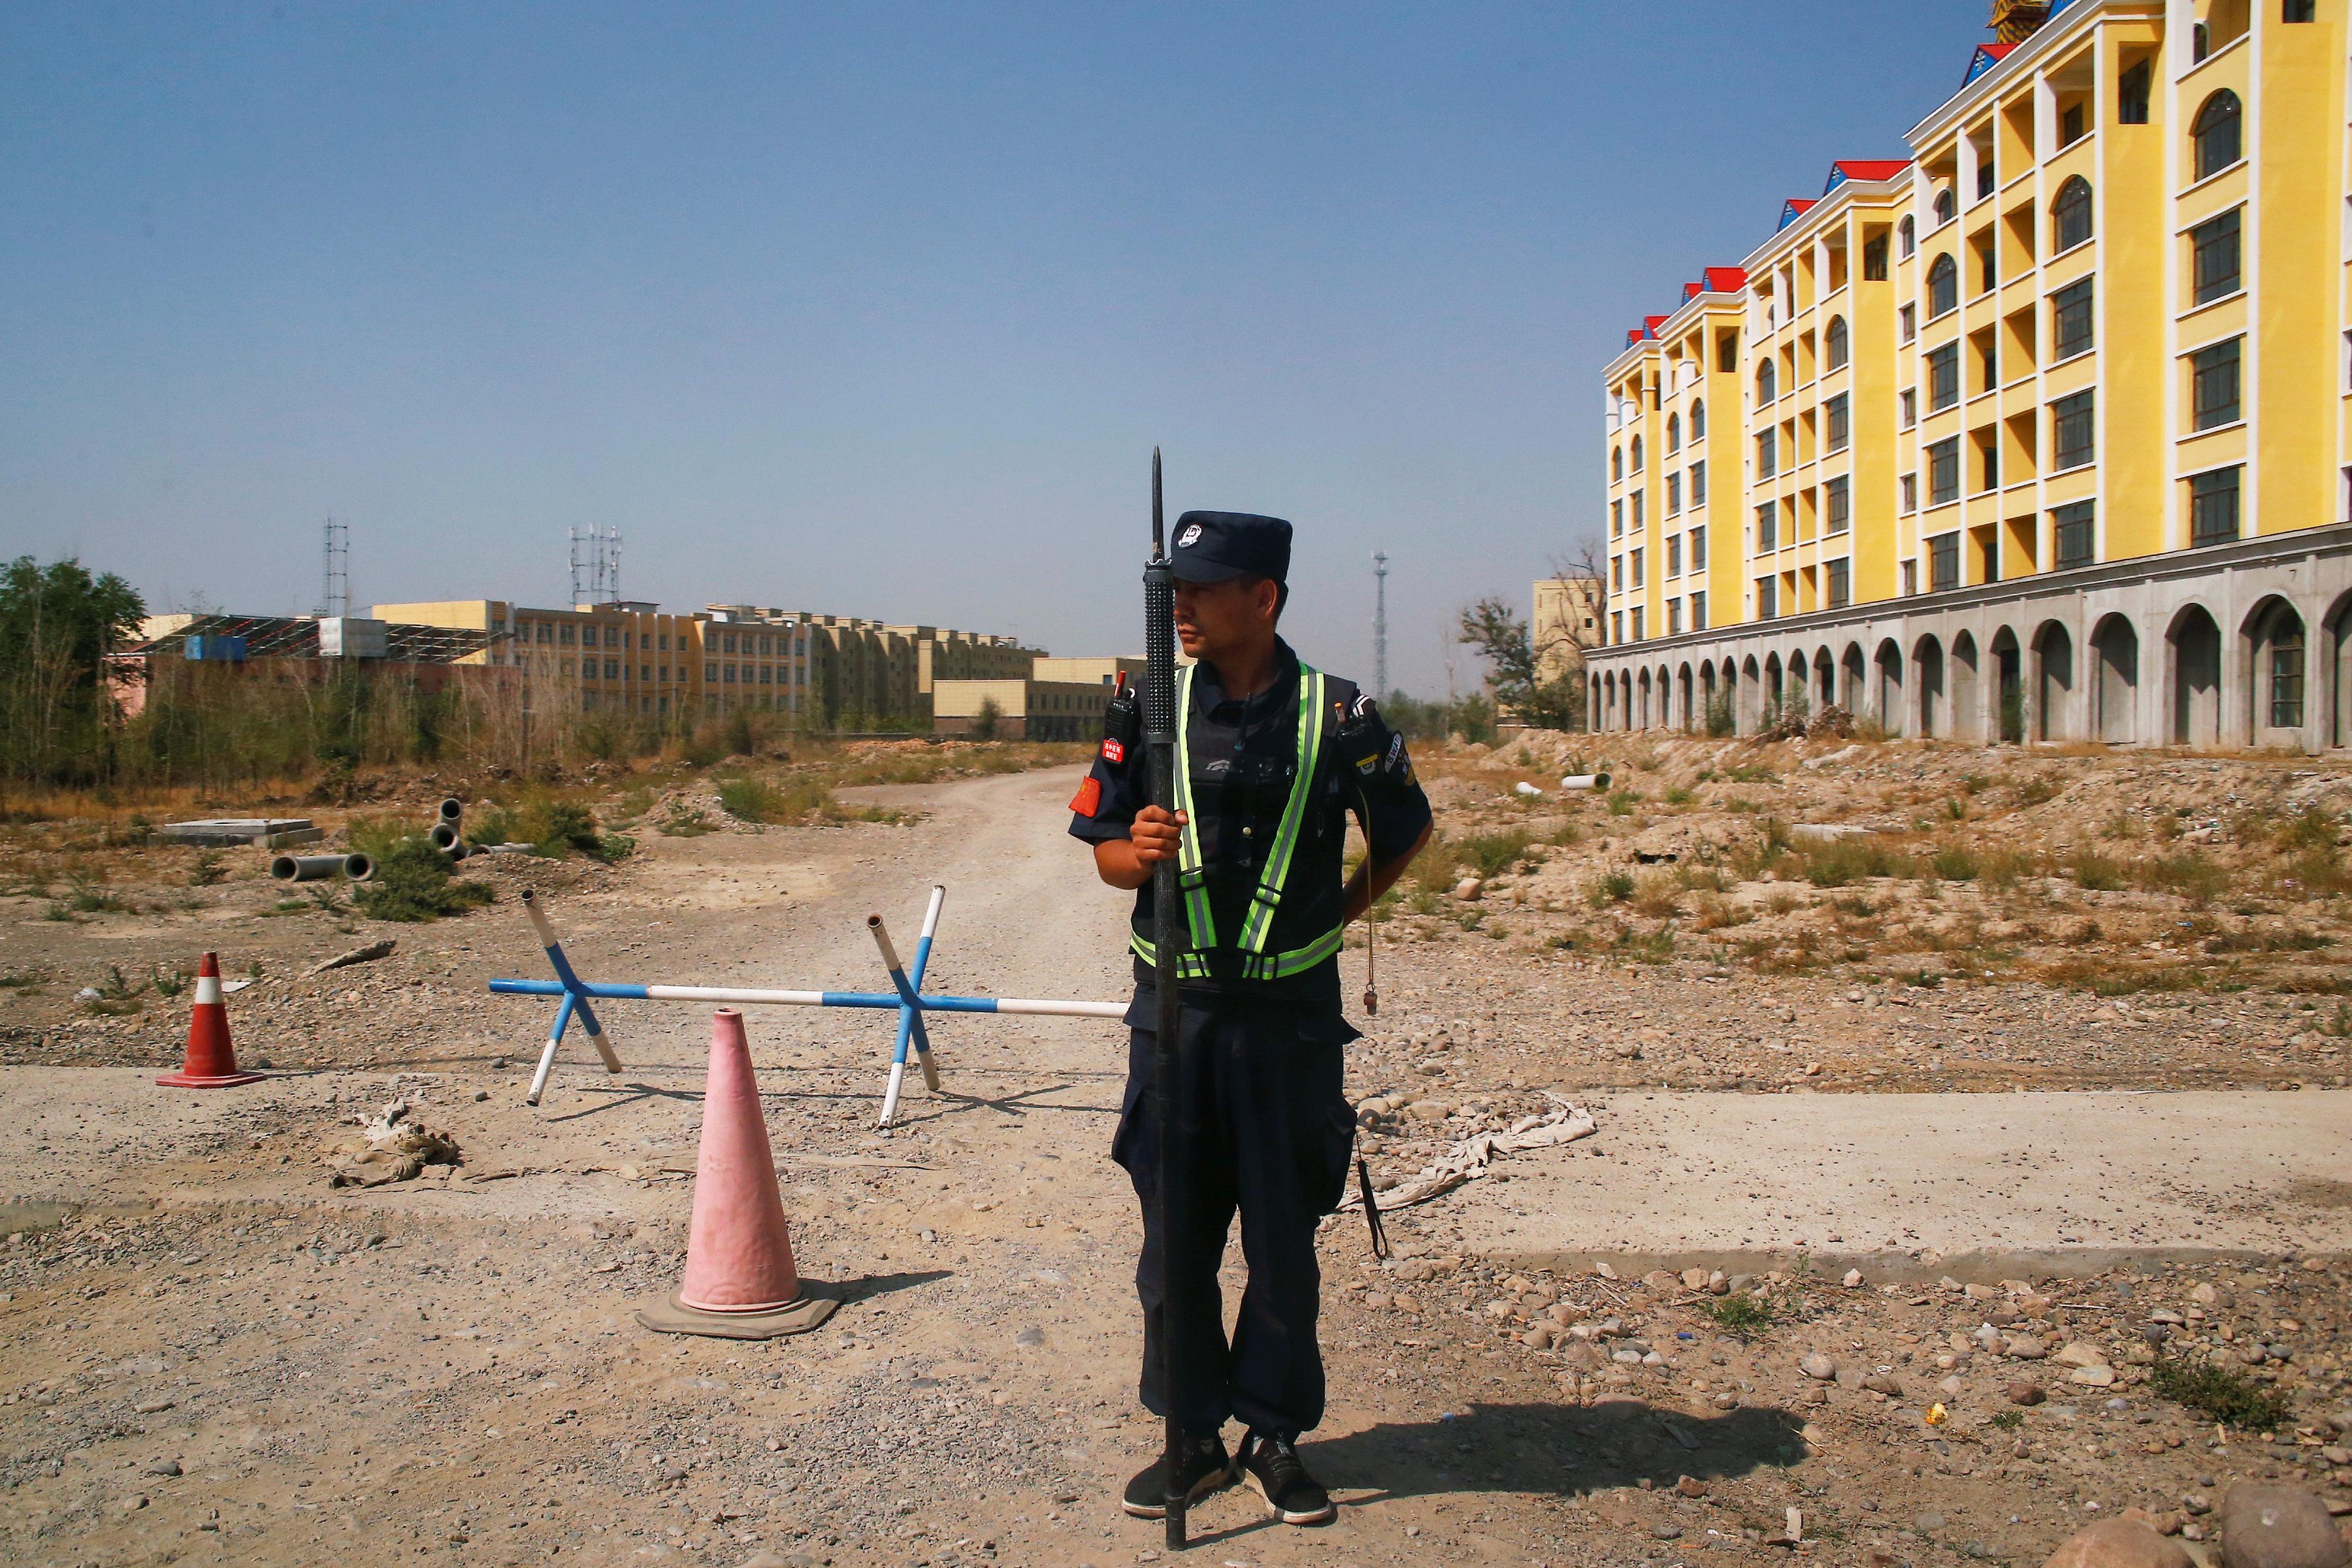 China warns U.S. over Uighur bill, raising doubts over early trade...